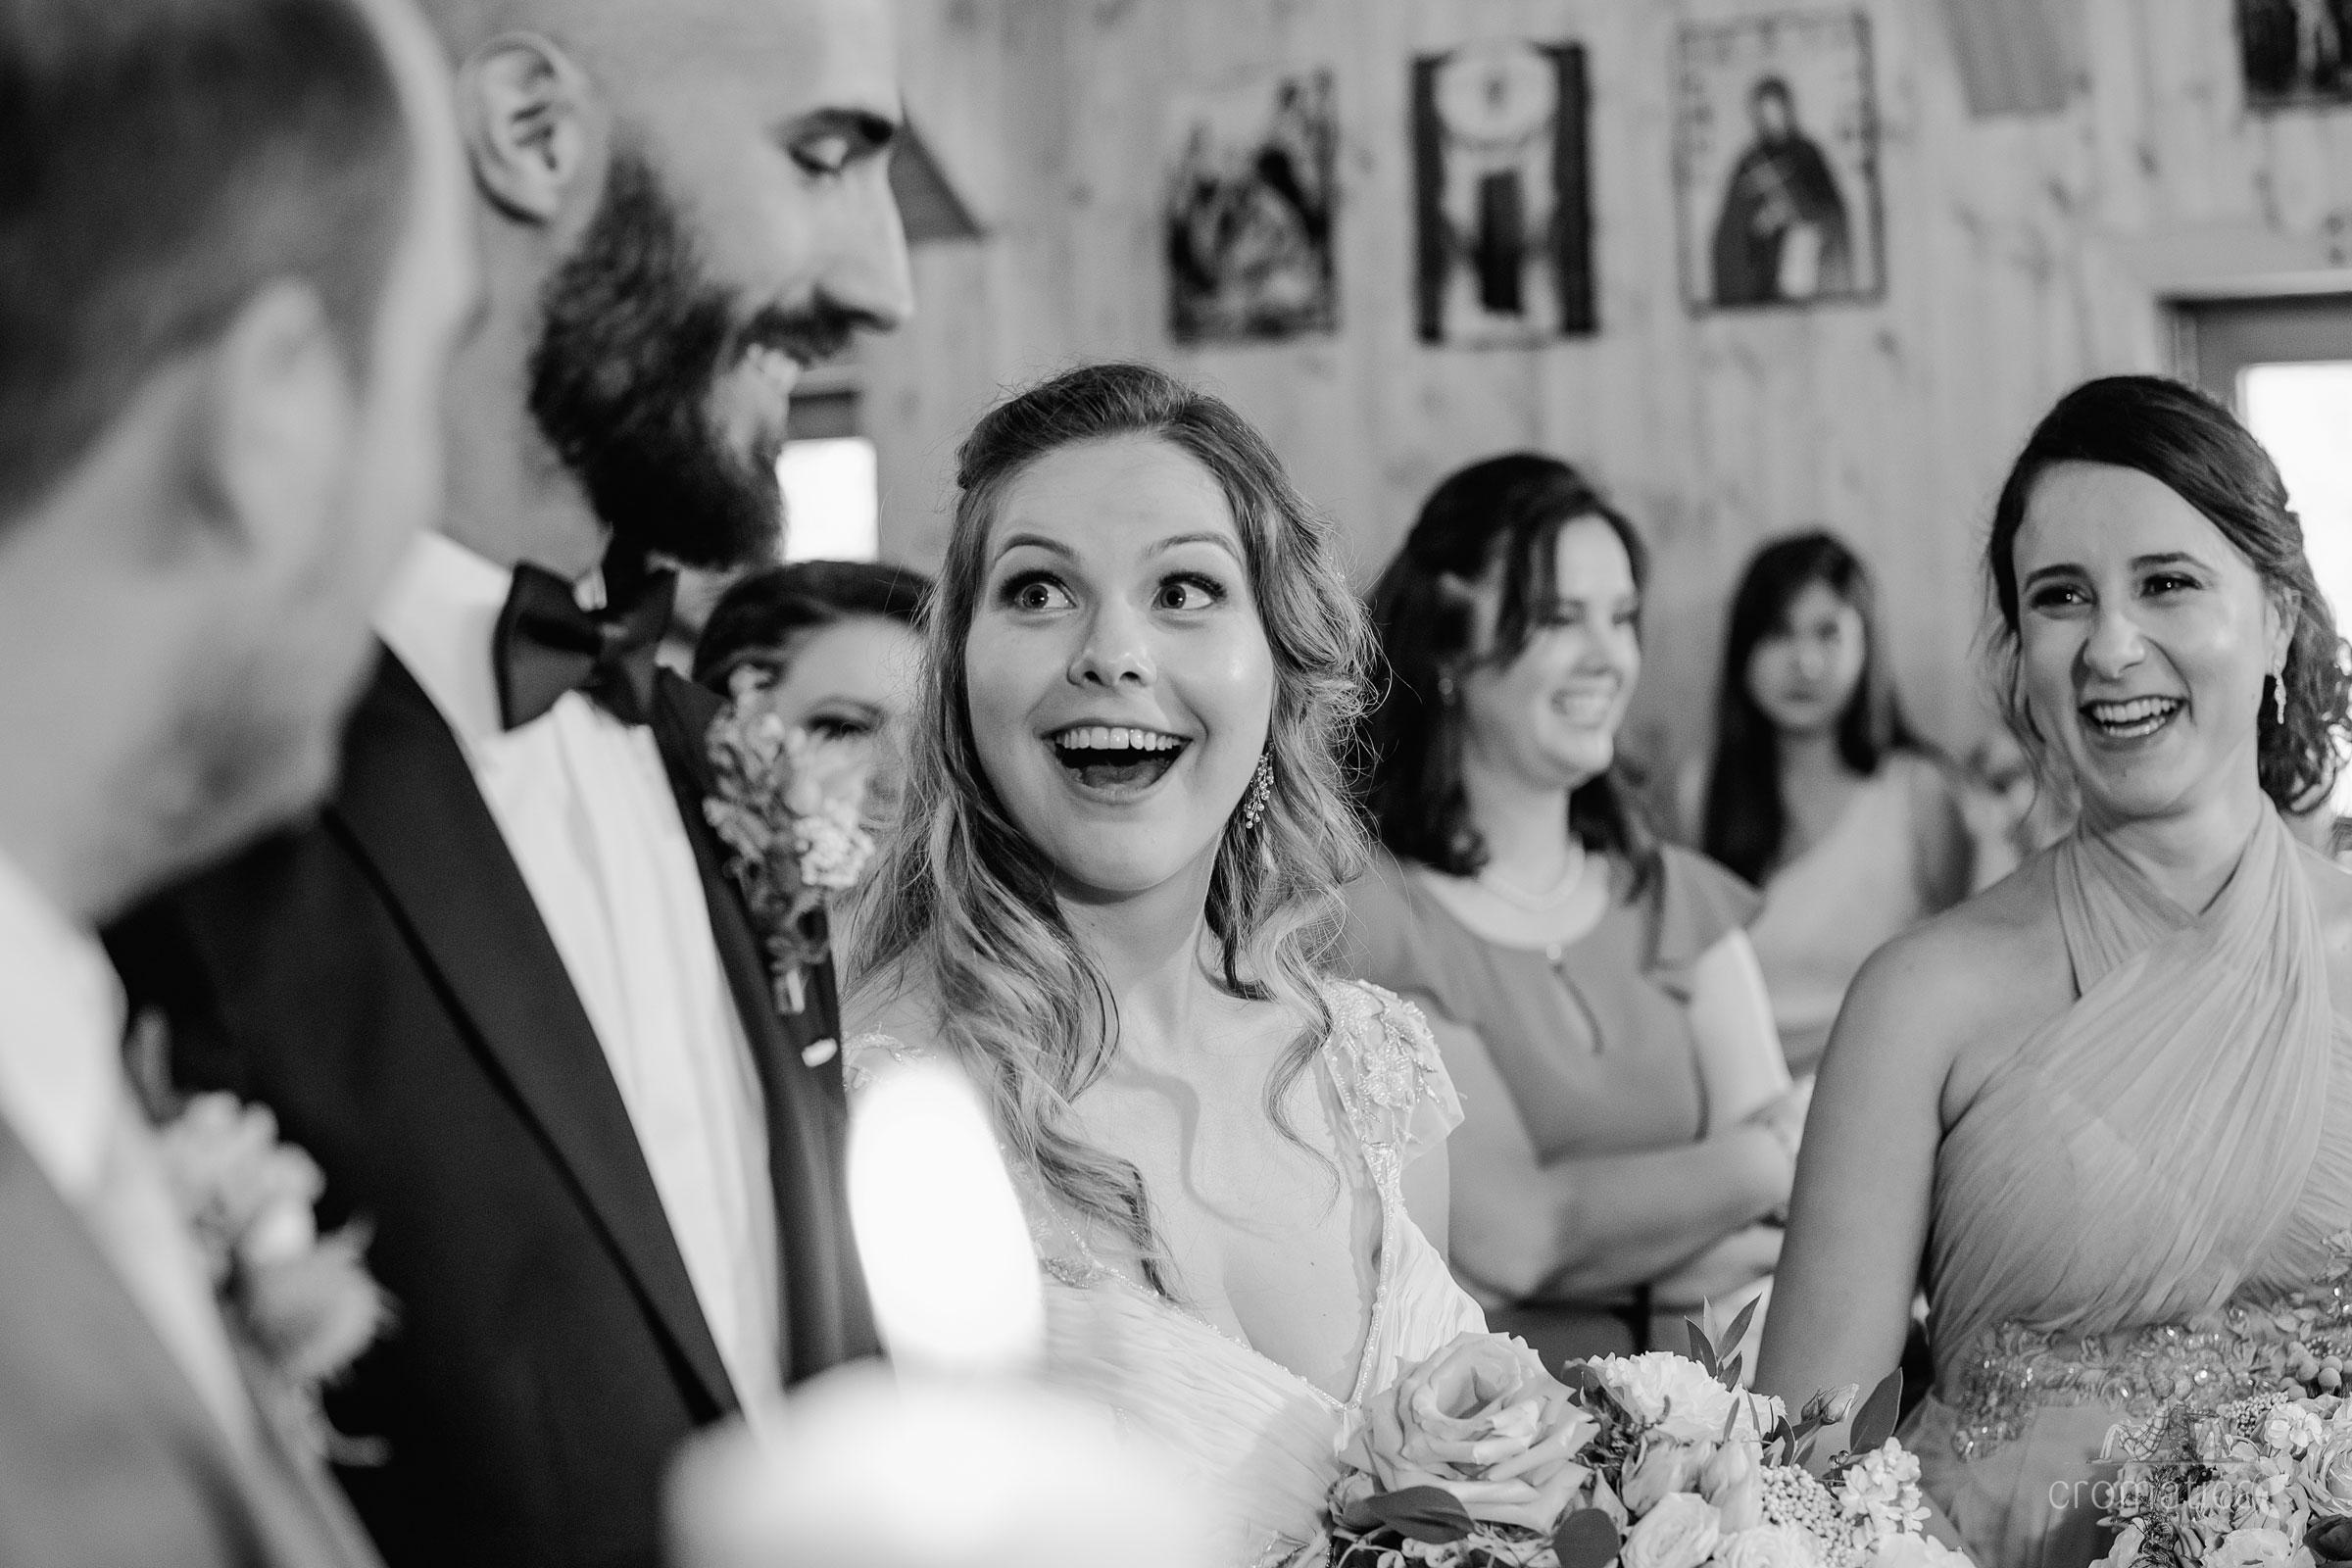 alexandra george fotografii nunta casa vlasia 050